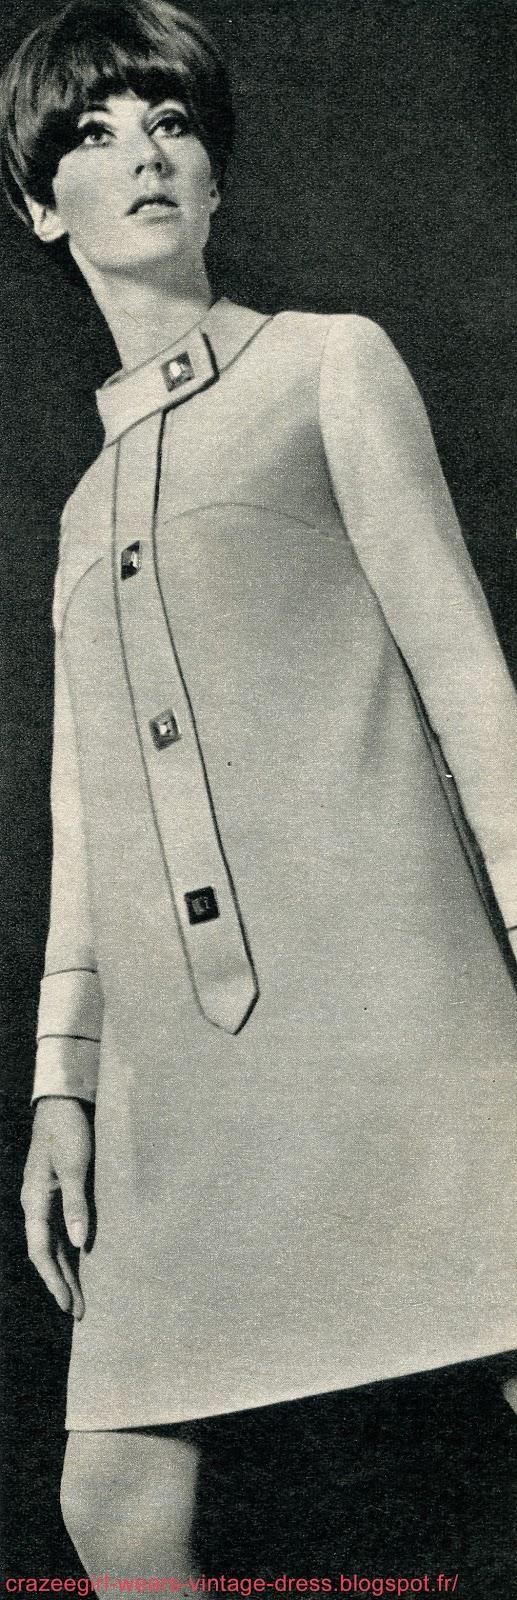 vintage dress 1967 60s 1960 annees 60 mod twiggy robe fibre polyester Trevira , création Maurice